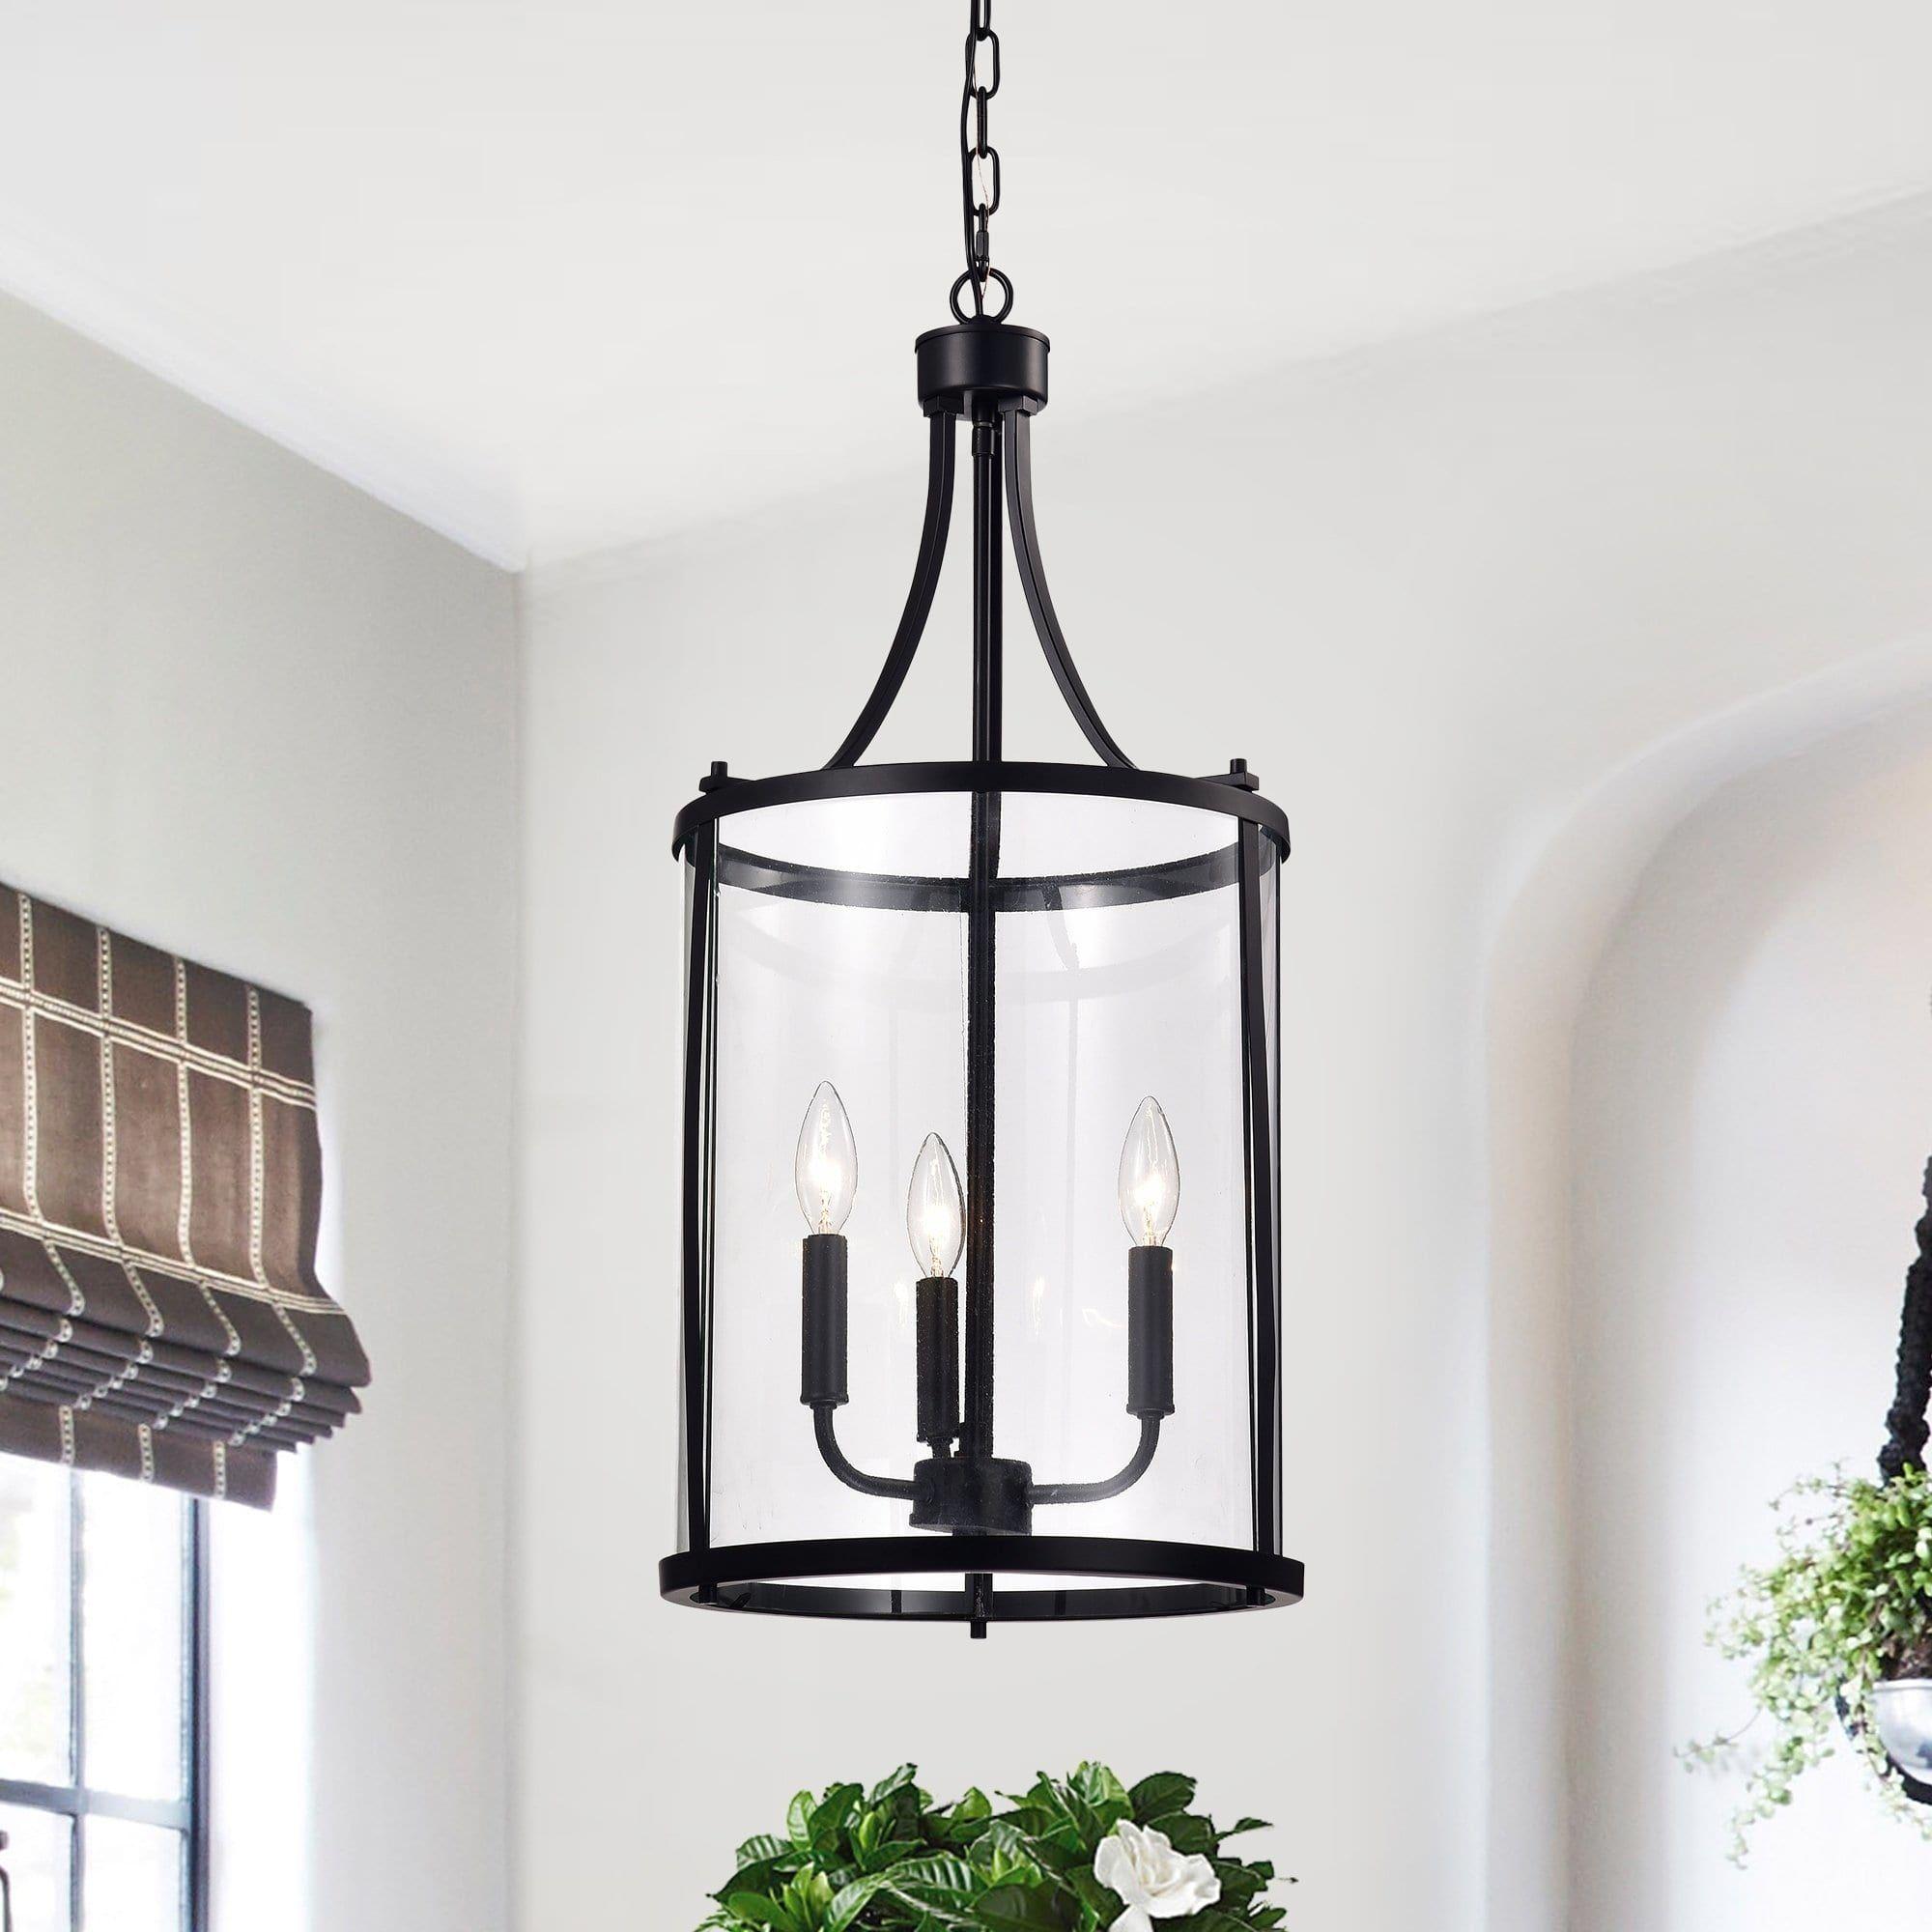 Hanma Matte Black 3 Light Candelabra Pendant Lantern Warehouse Of Tiffany Glass Lantern Pendant Lantern Lights Black Chandelier